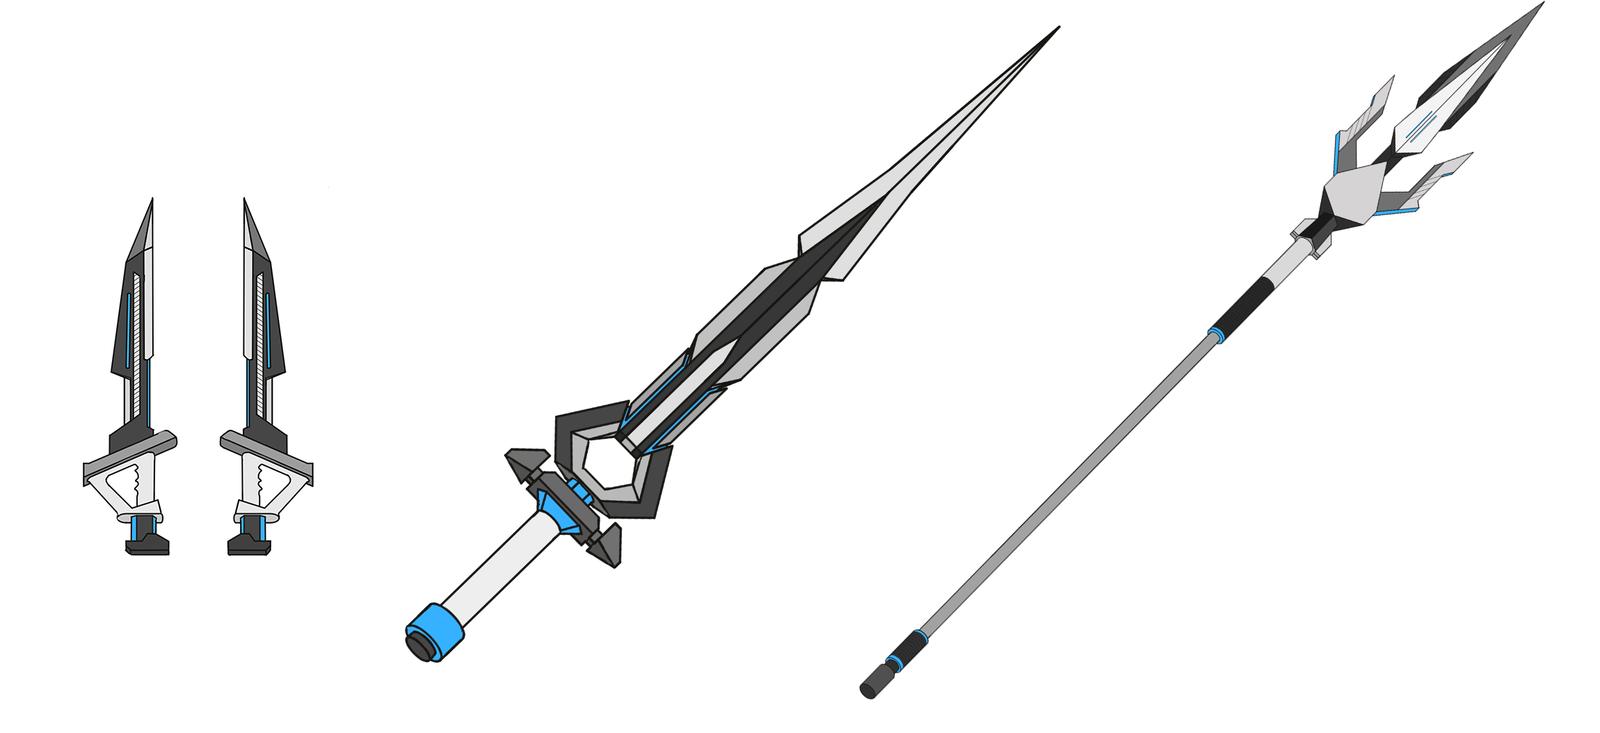 Weapon design - Project Gungnir